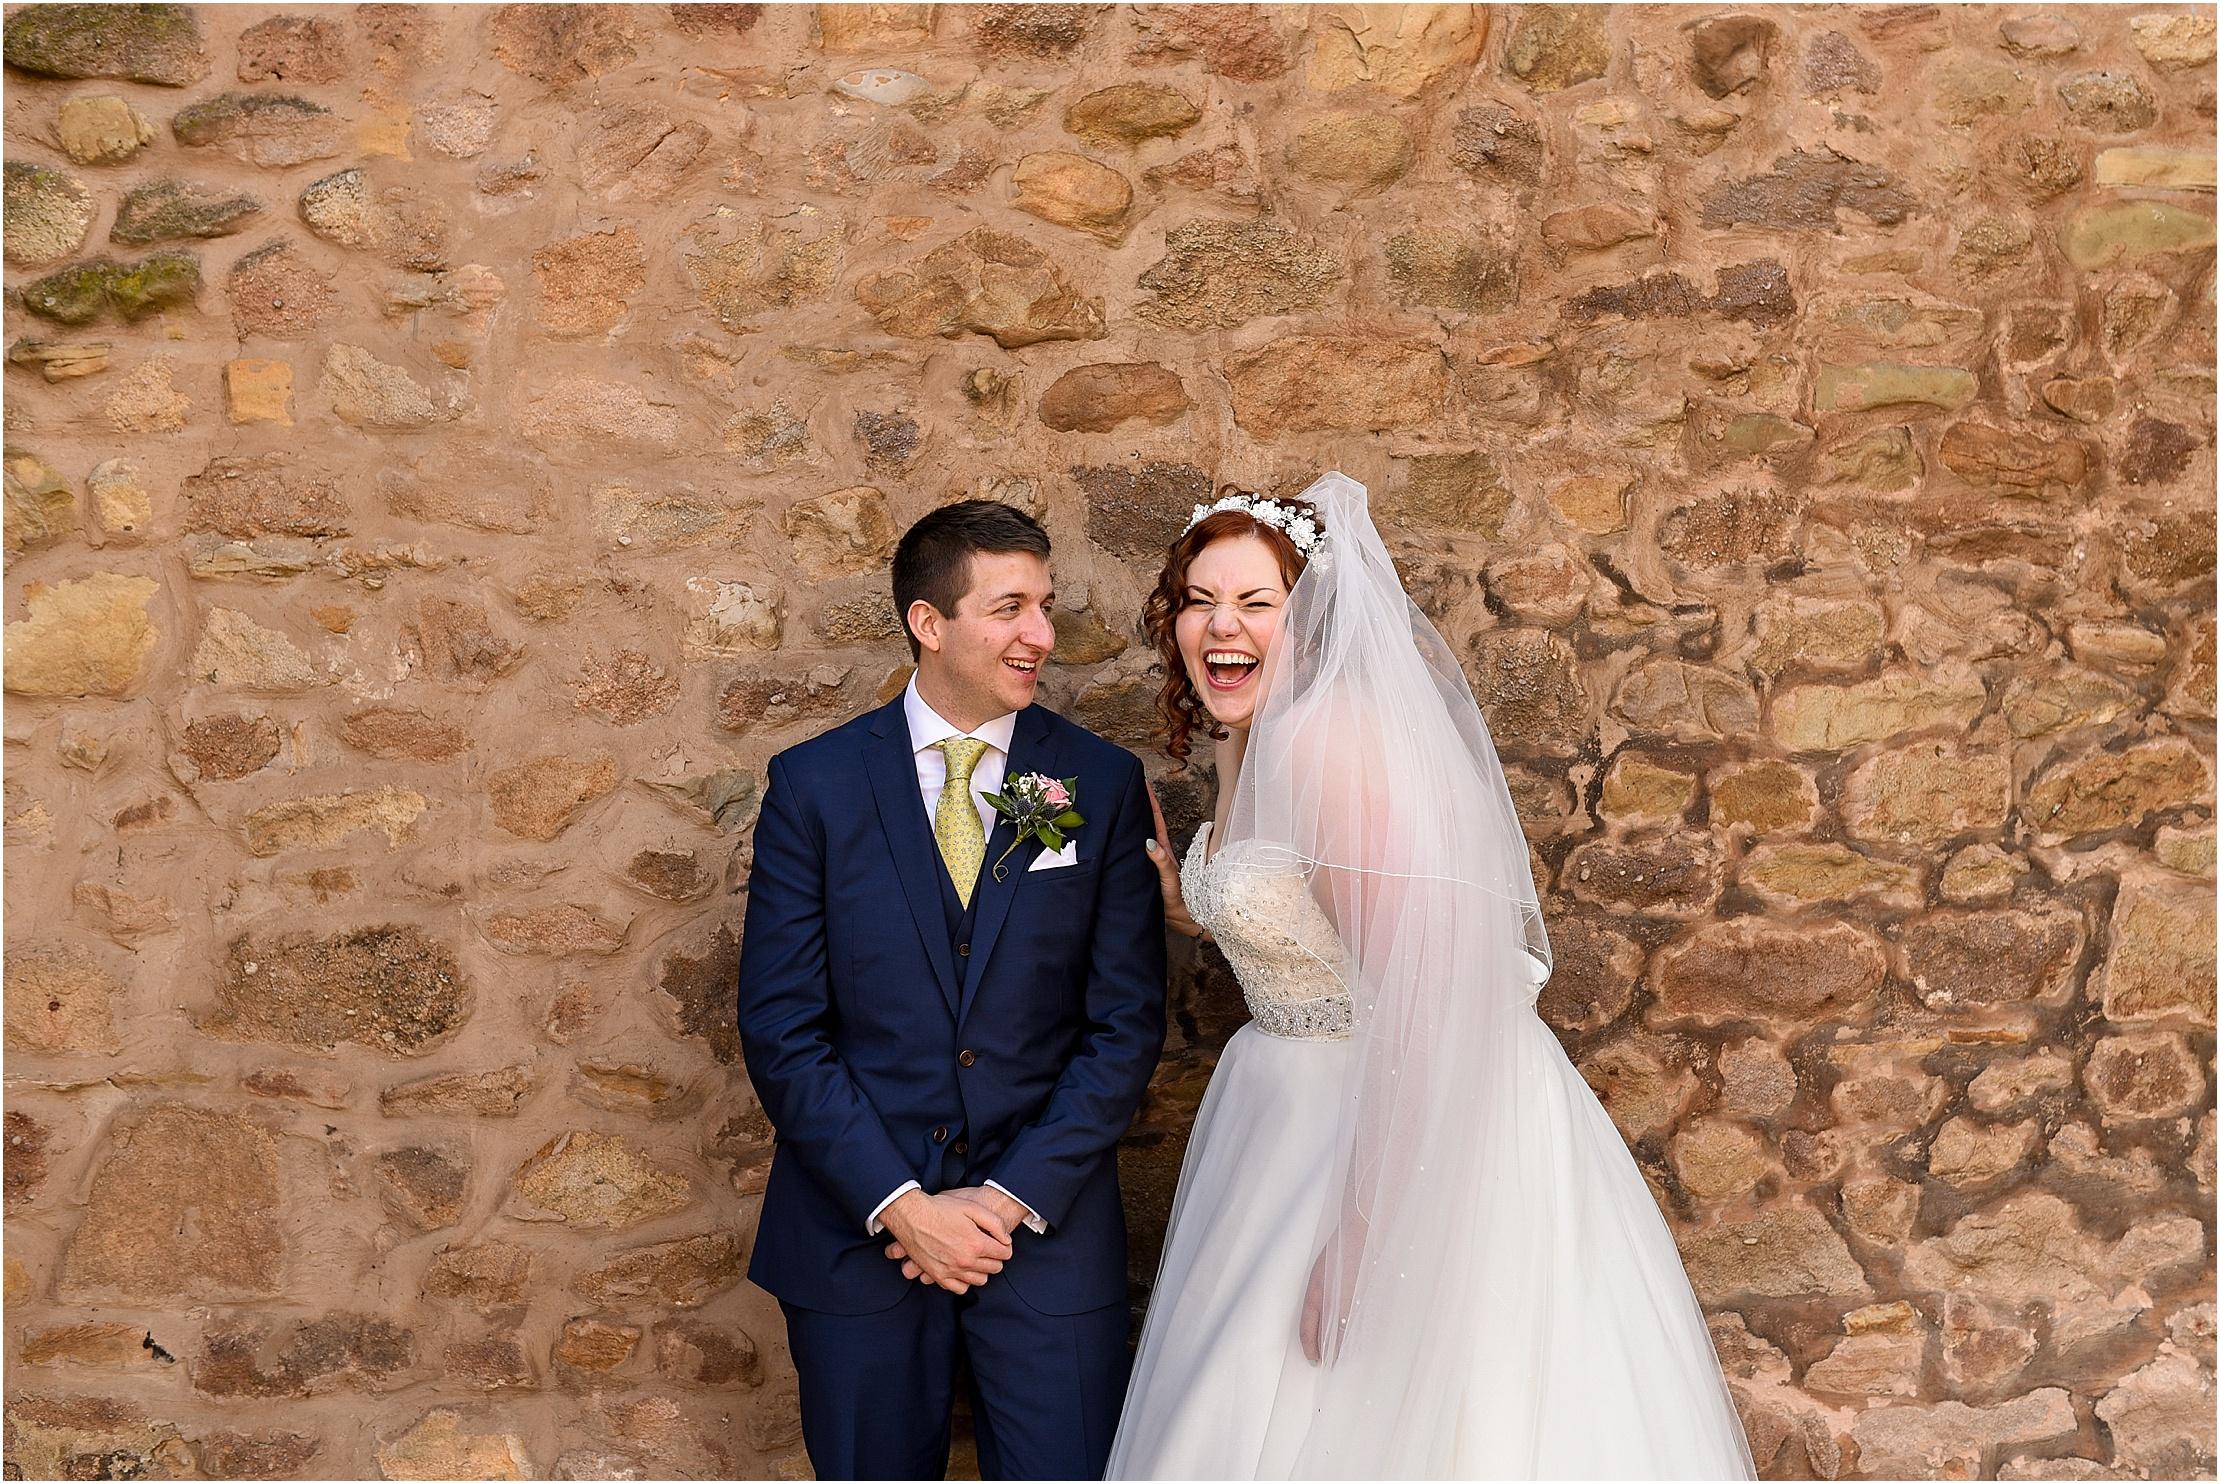 shireburn-arms-wedding- 093.jpg